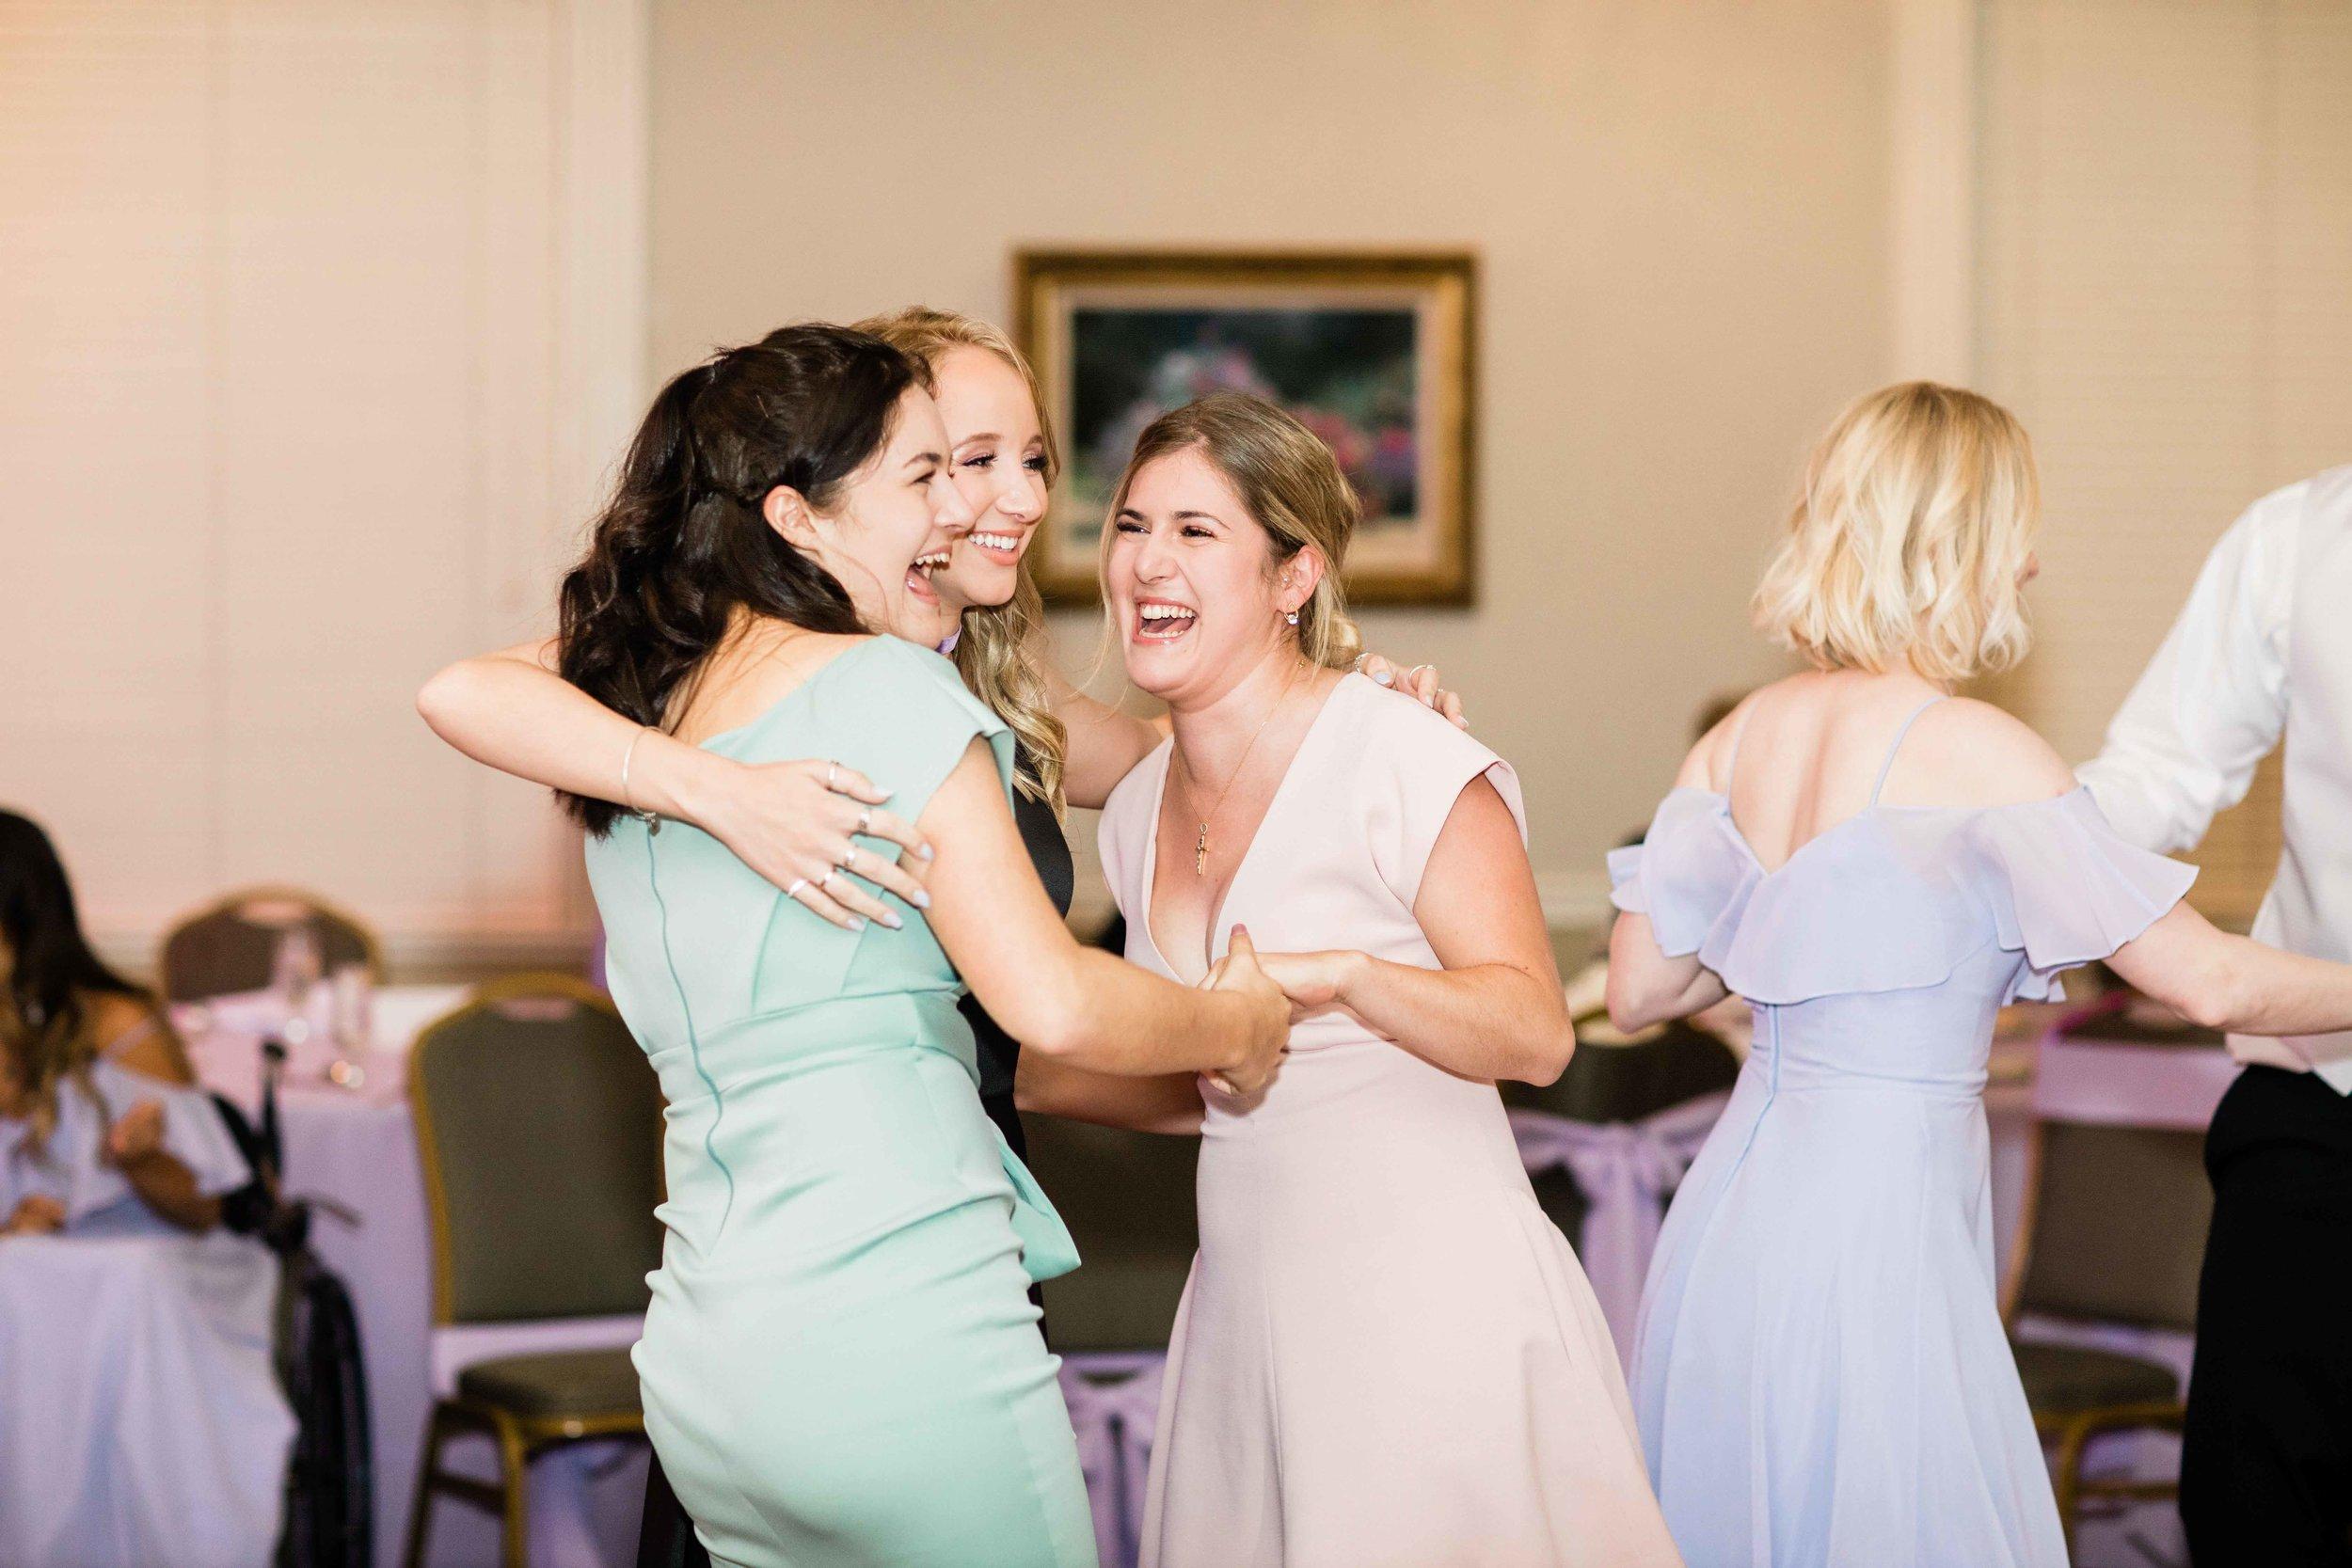 wedding reception photographers cincinnati dayton ohio-6.jpg